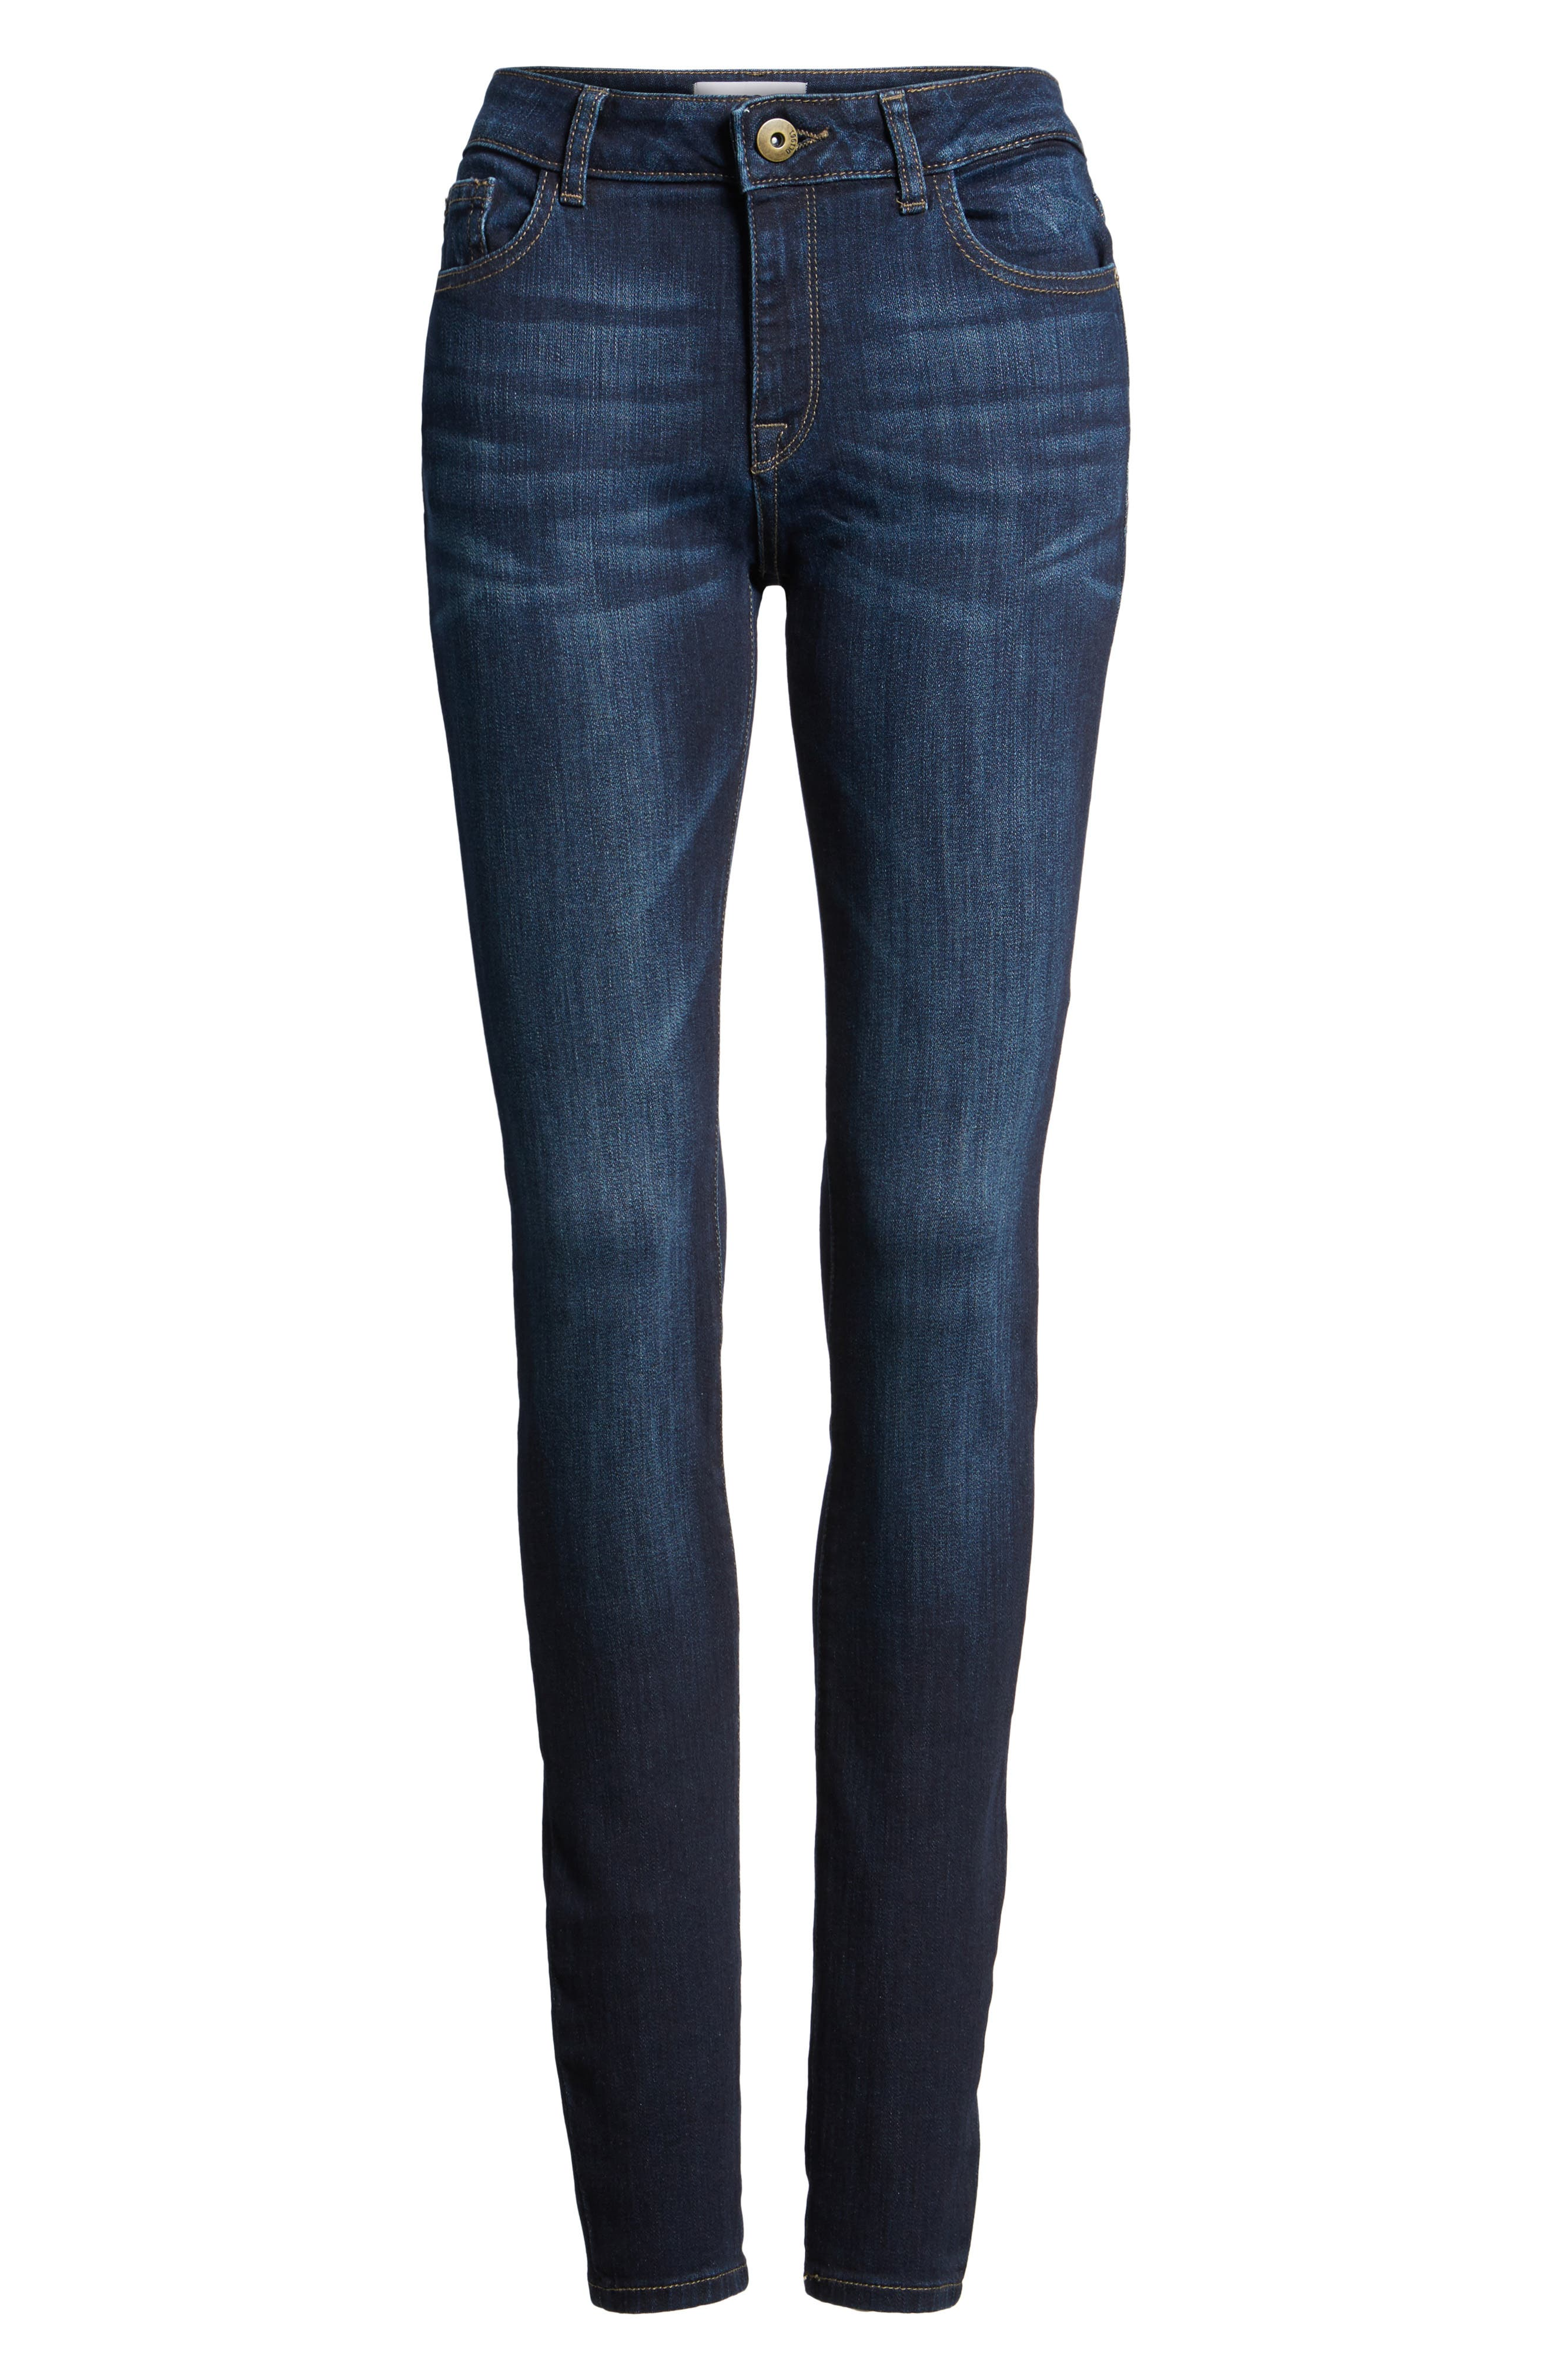 'Danny' Instasculpt Skinny Jeans,                             Alternate thumbnail 6, color,                             Pulse